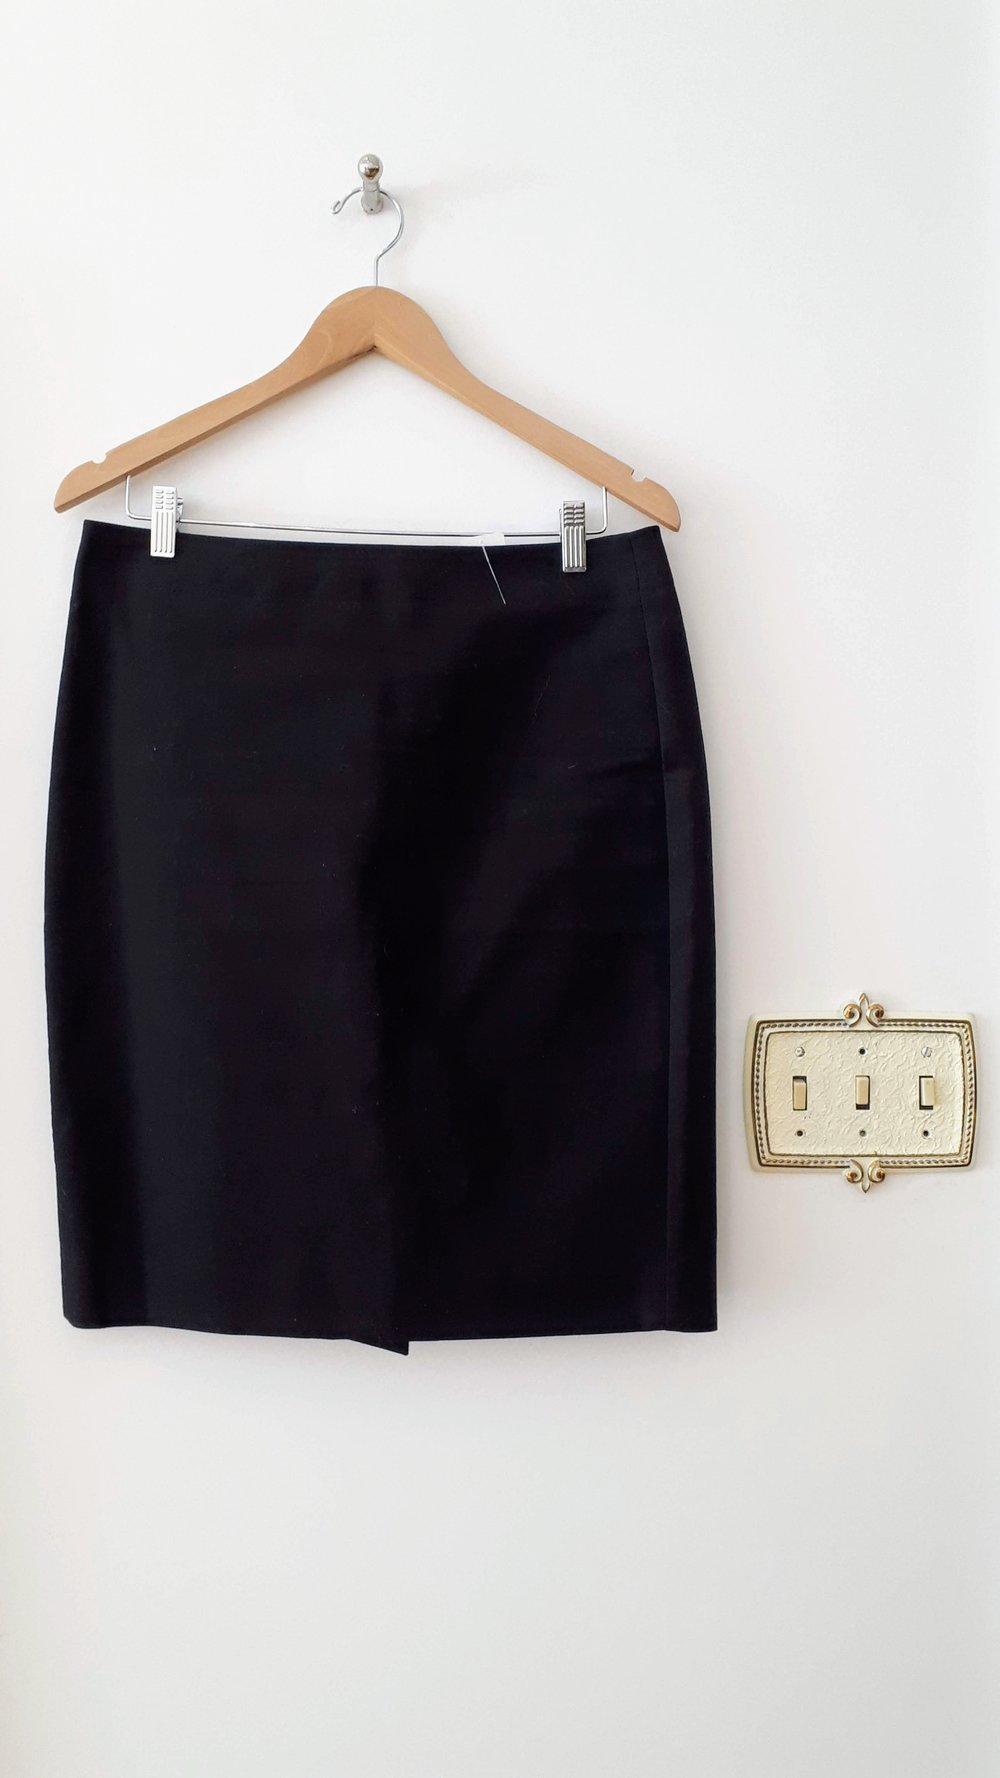 J Crew skirt; Size 8, $30 (on sale $15!)